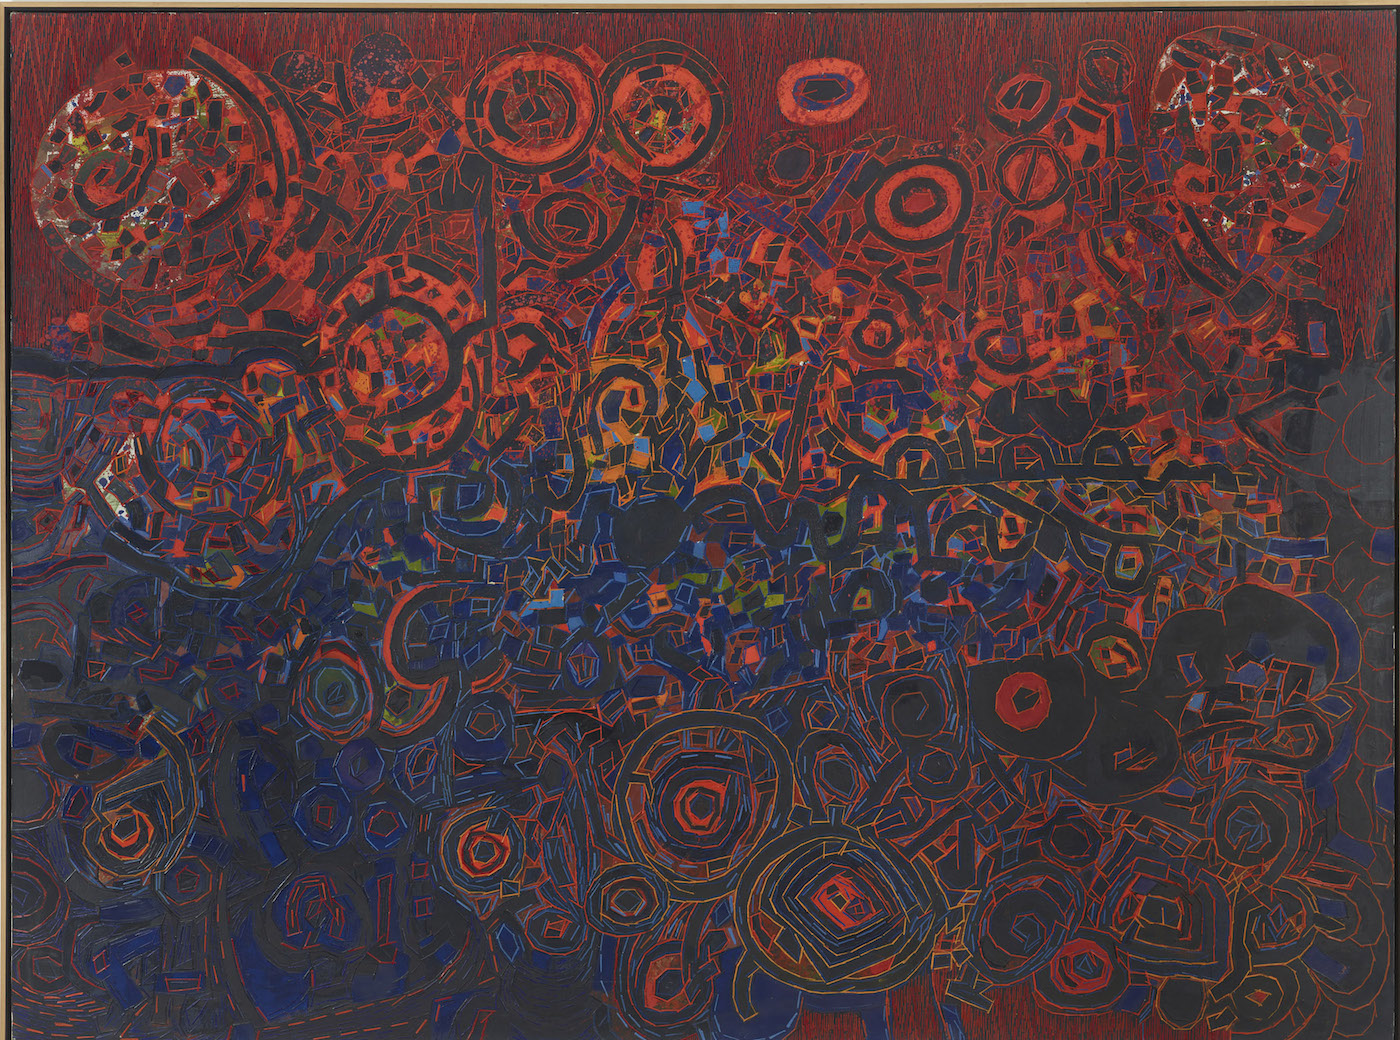 LEE MULLICAN- Untitled (1965)